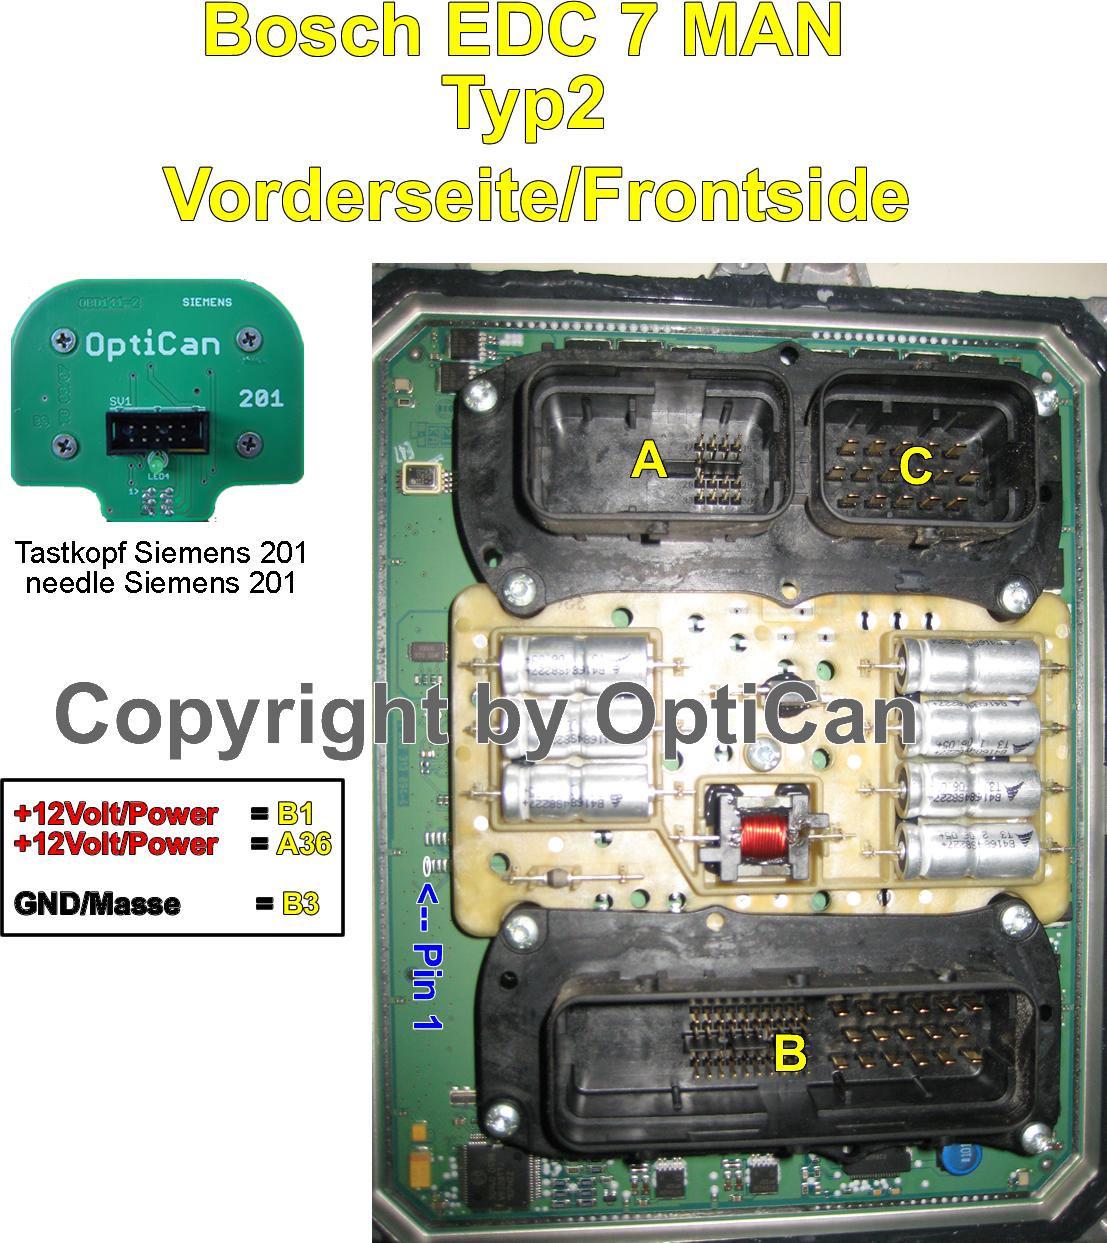 File:Bosch EDC7 MAN TYP2 Front.jpg.